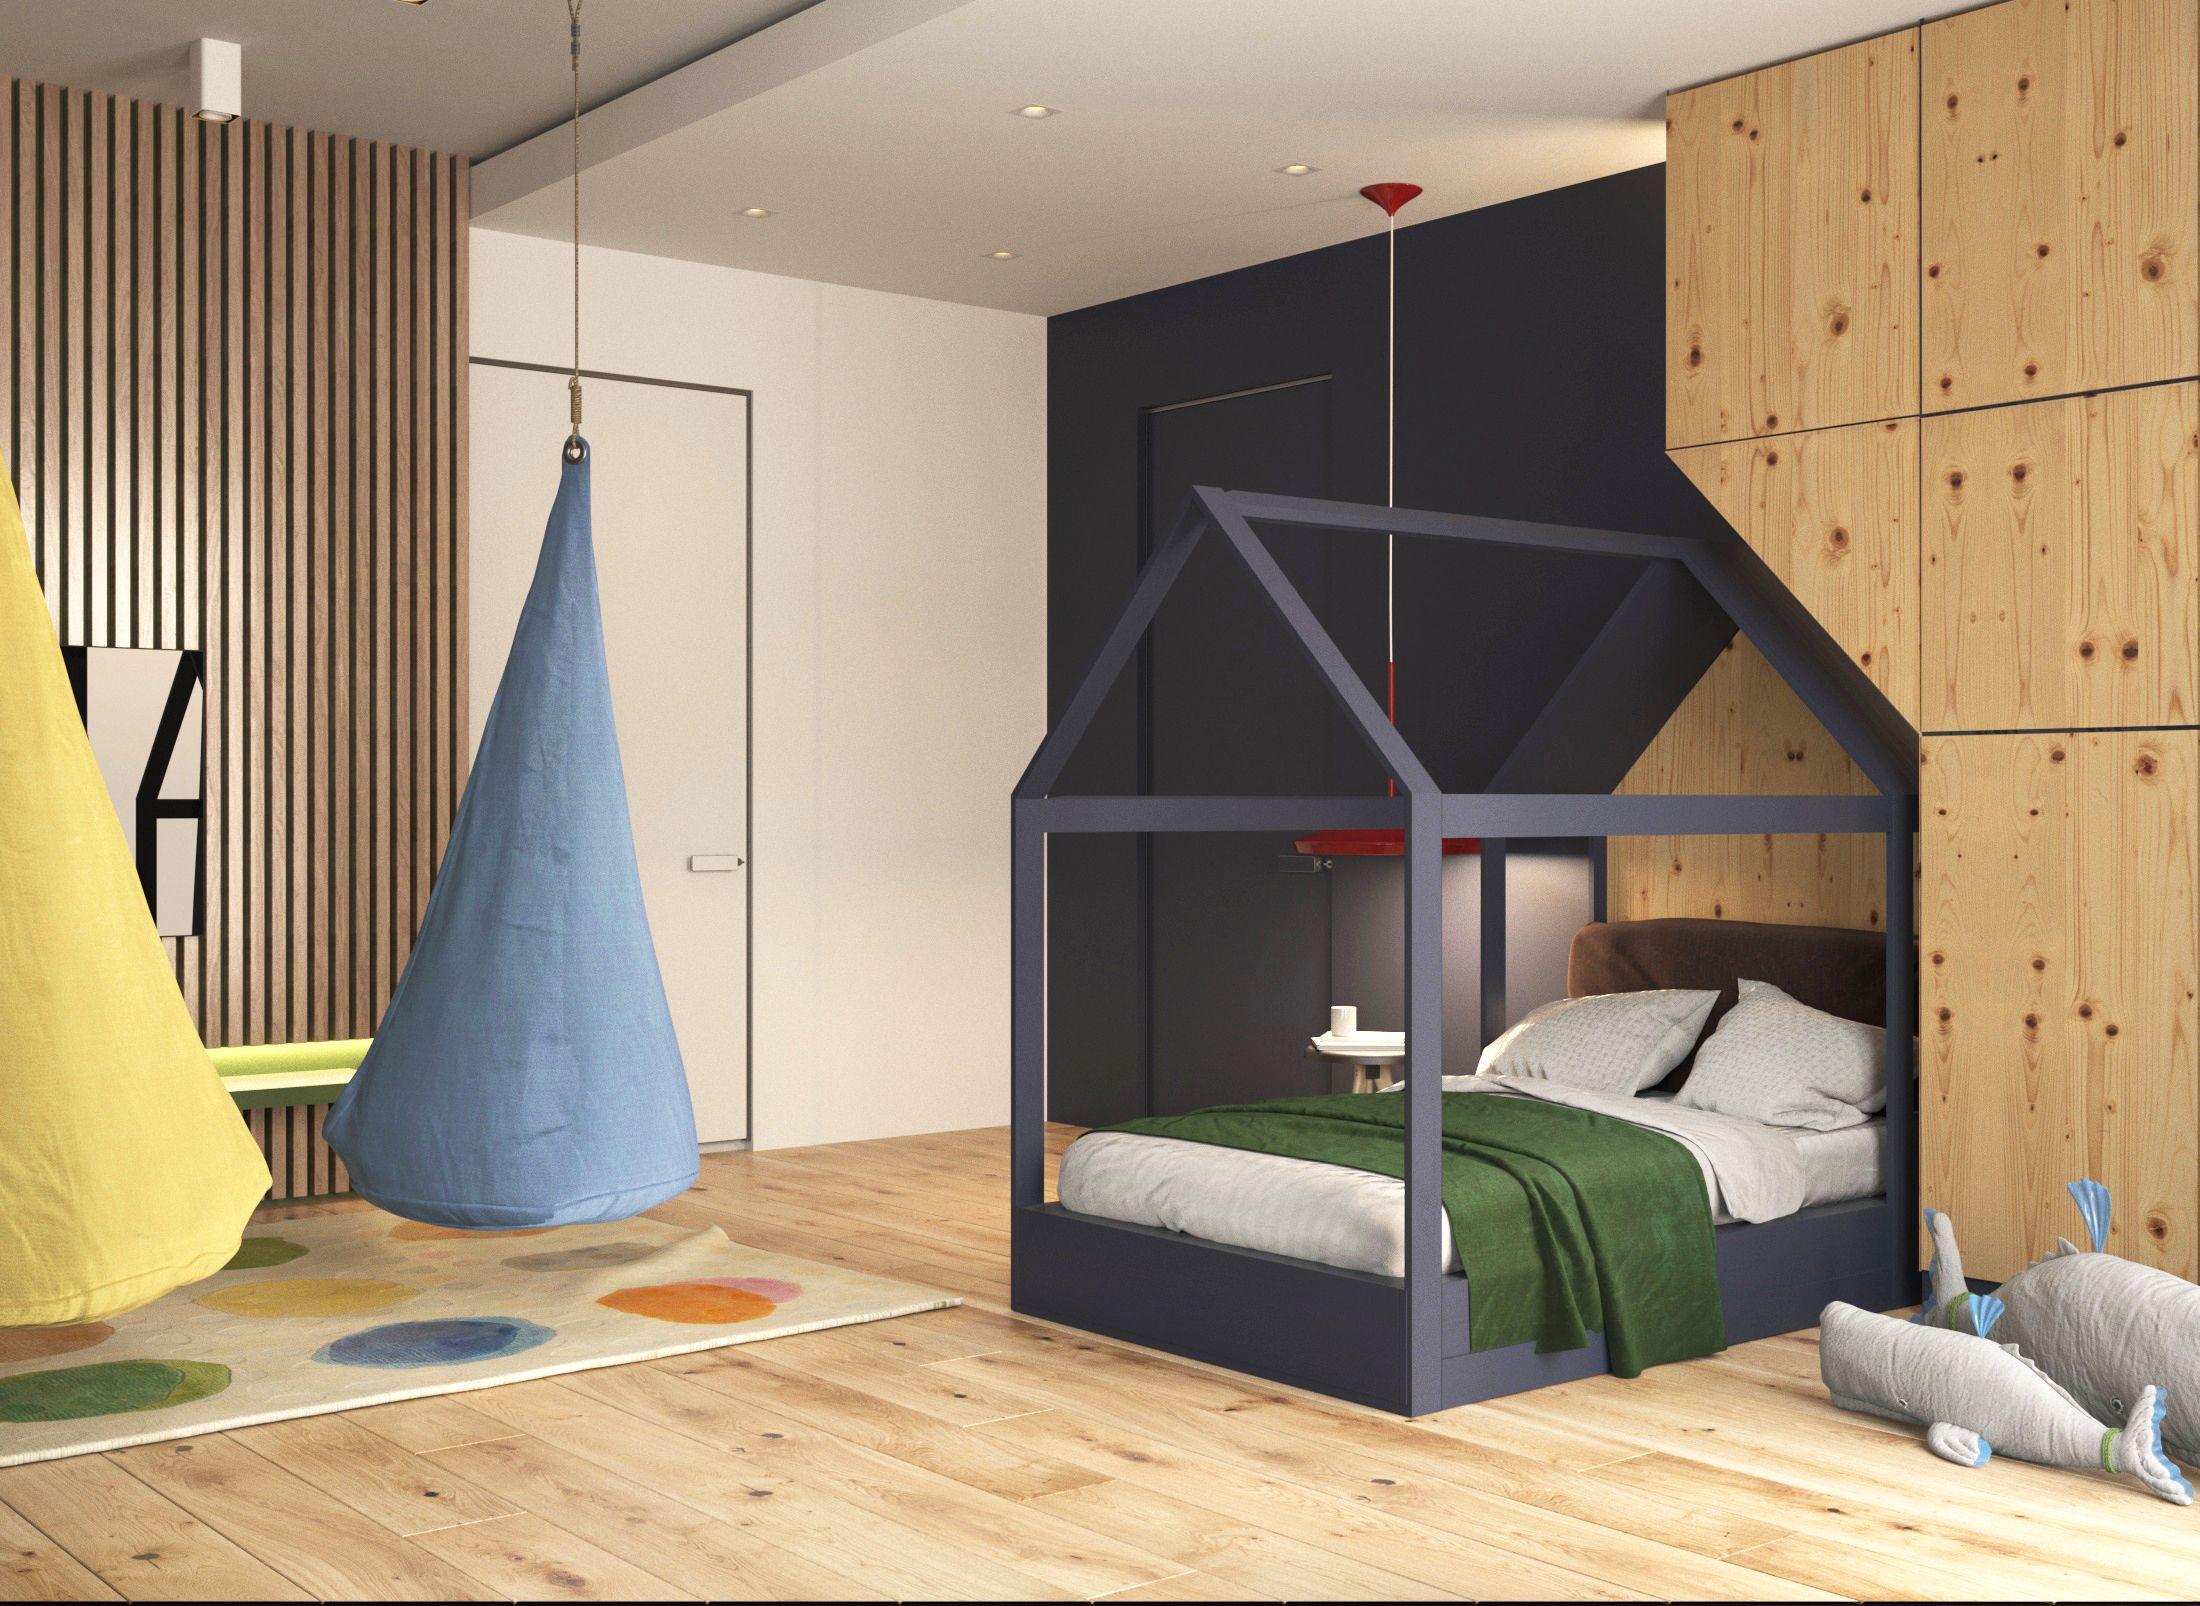 K1 House Kid Room Decor Home Bedroom Kids Room Design